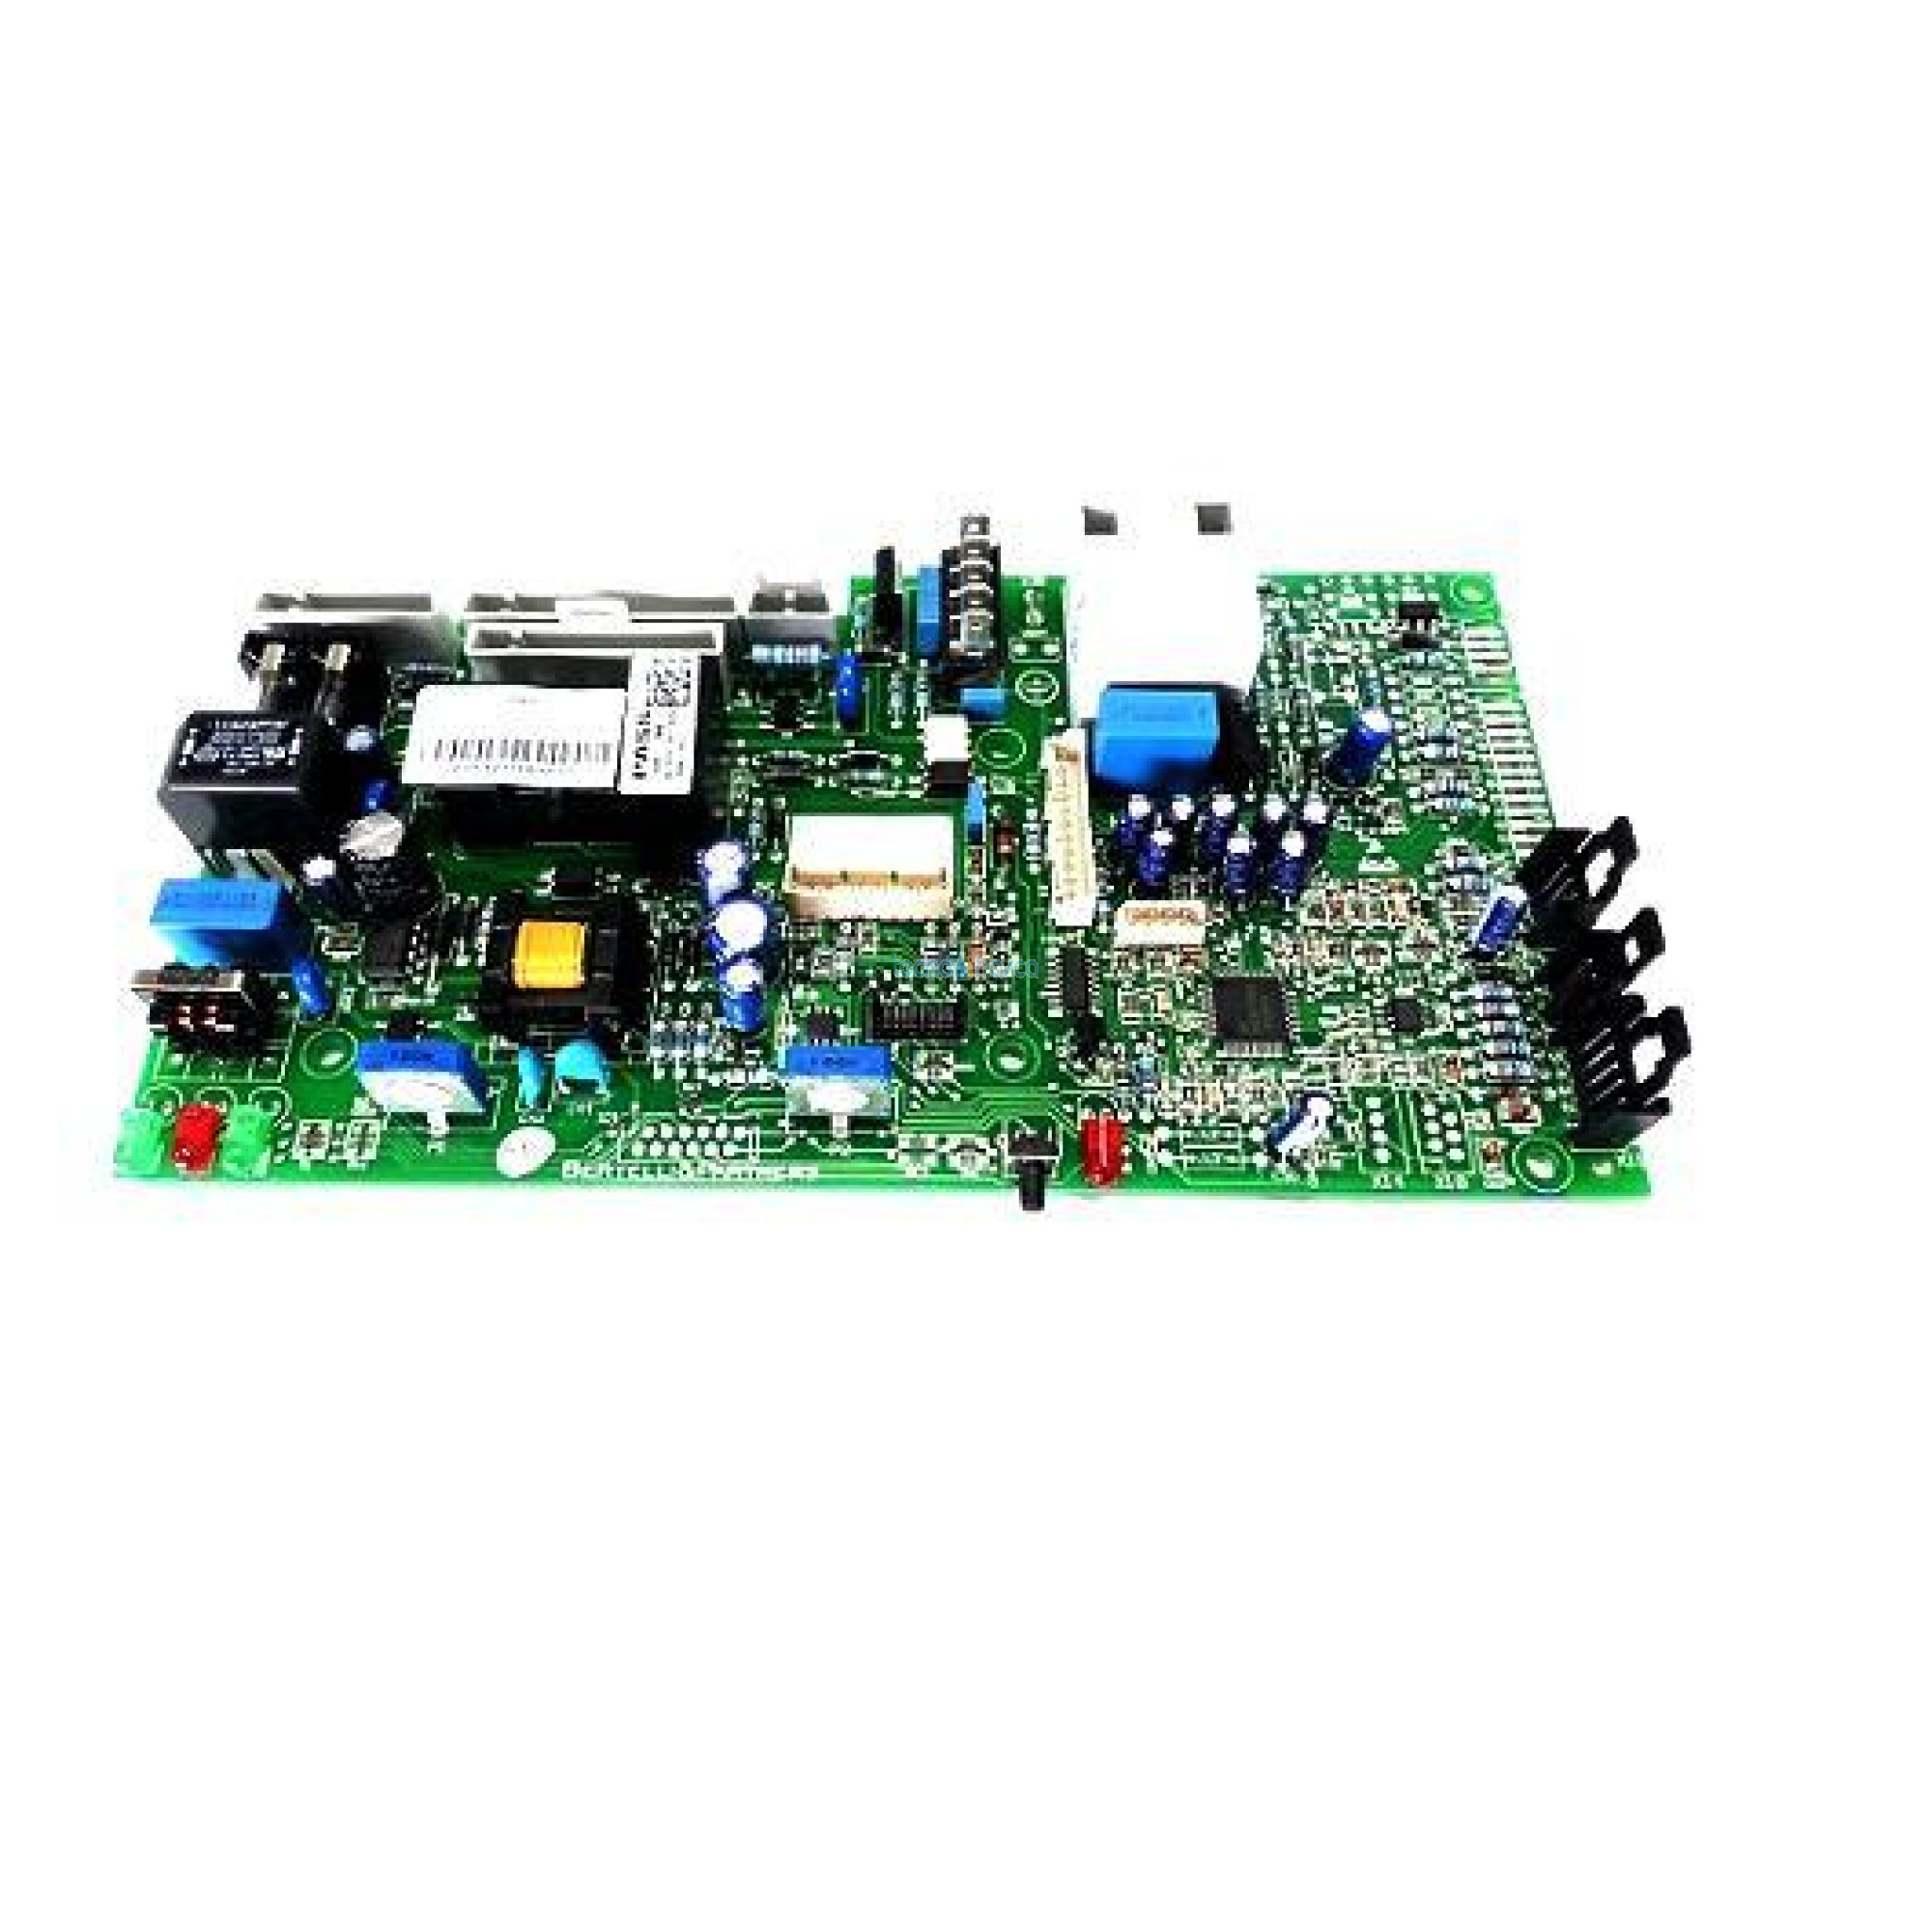 Savio biasi scheda integrata b&p m290 med bi2015100